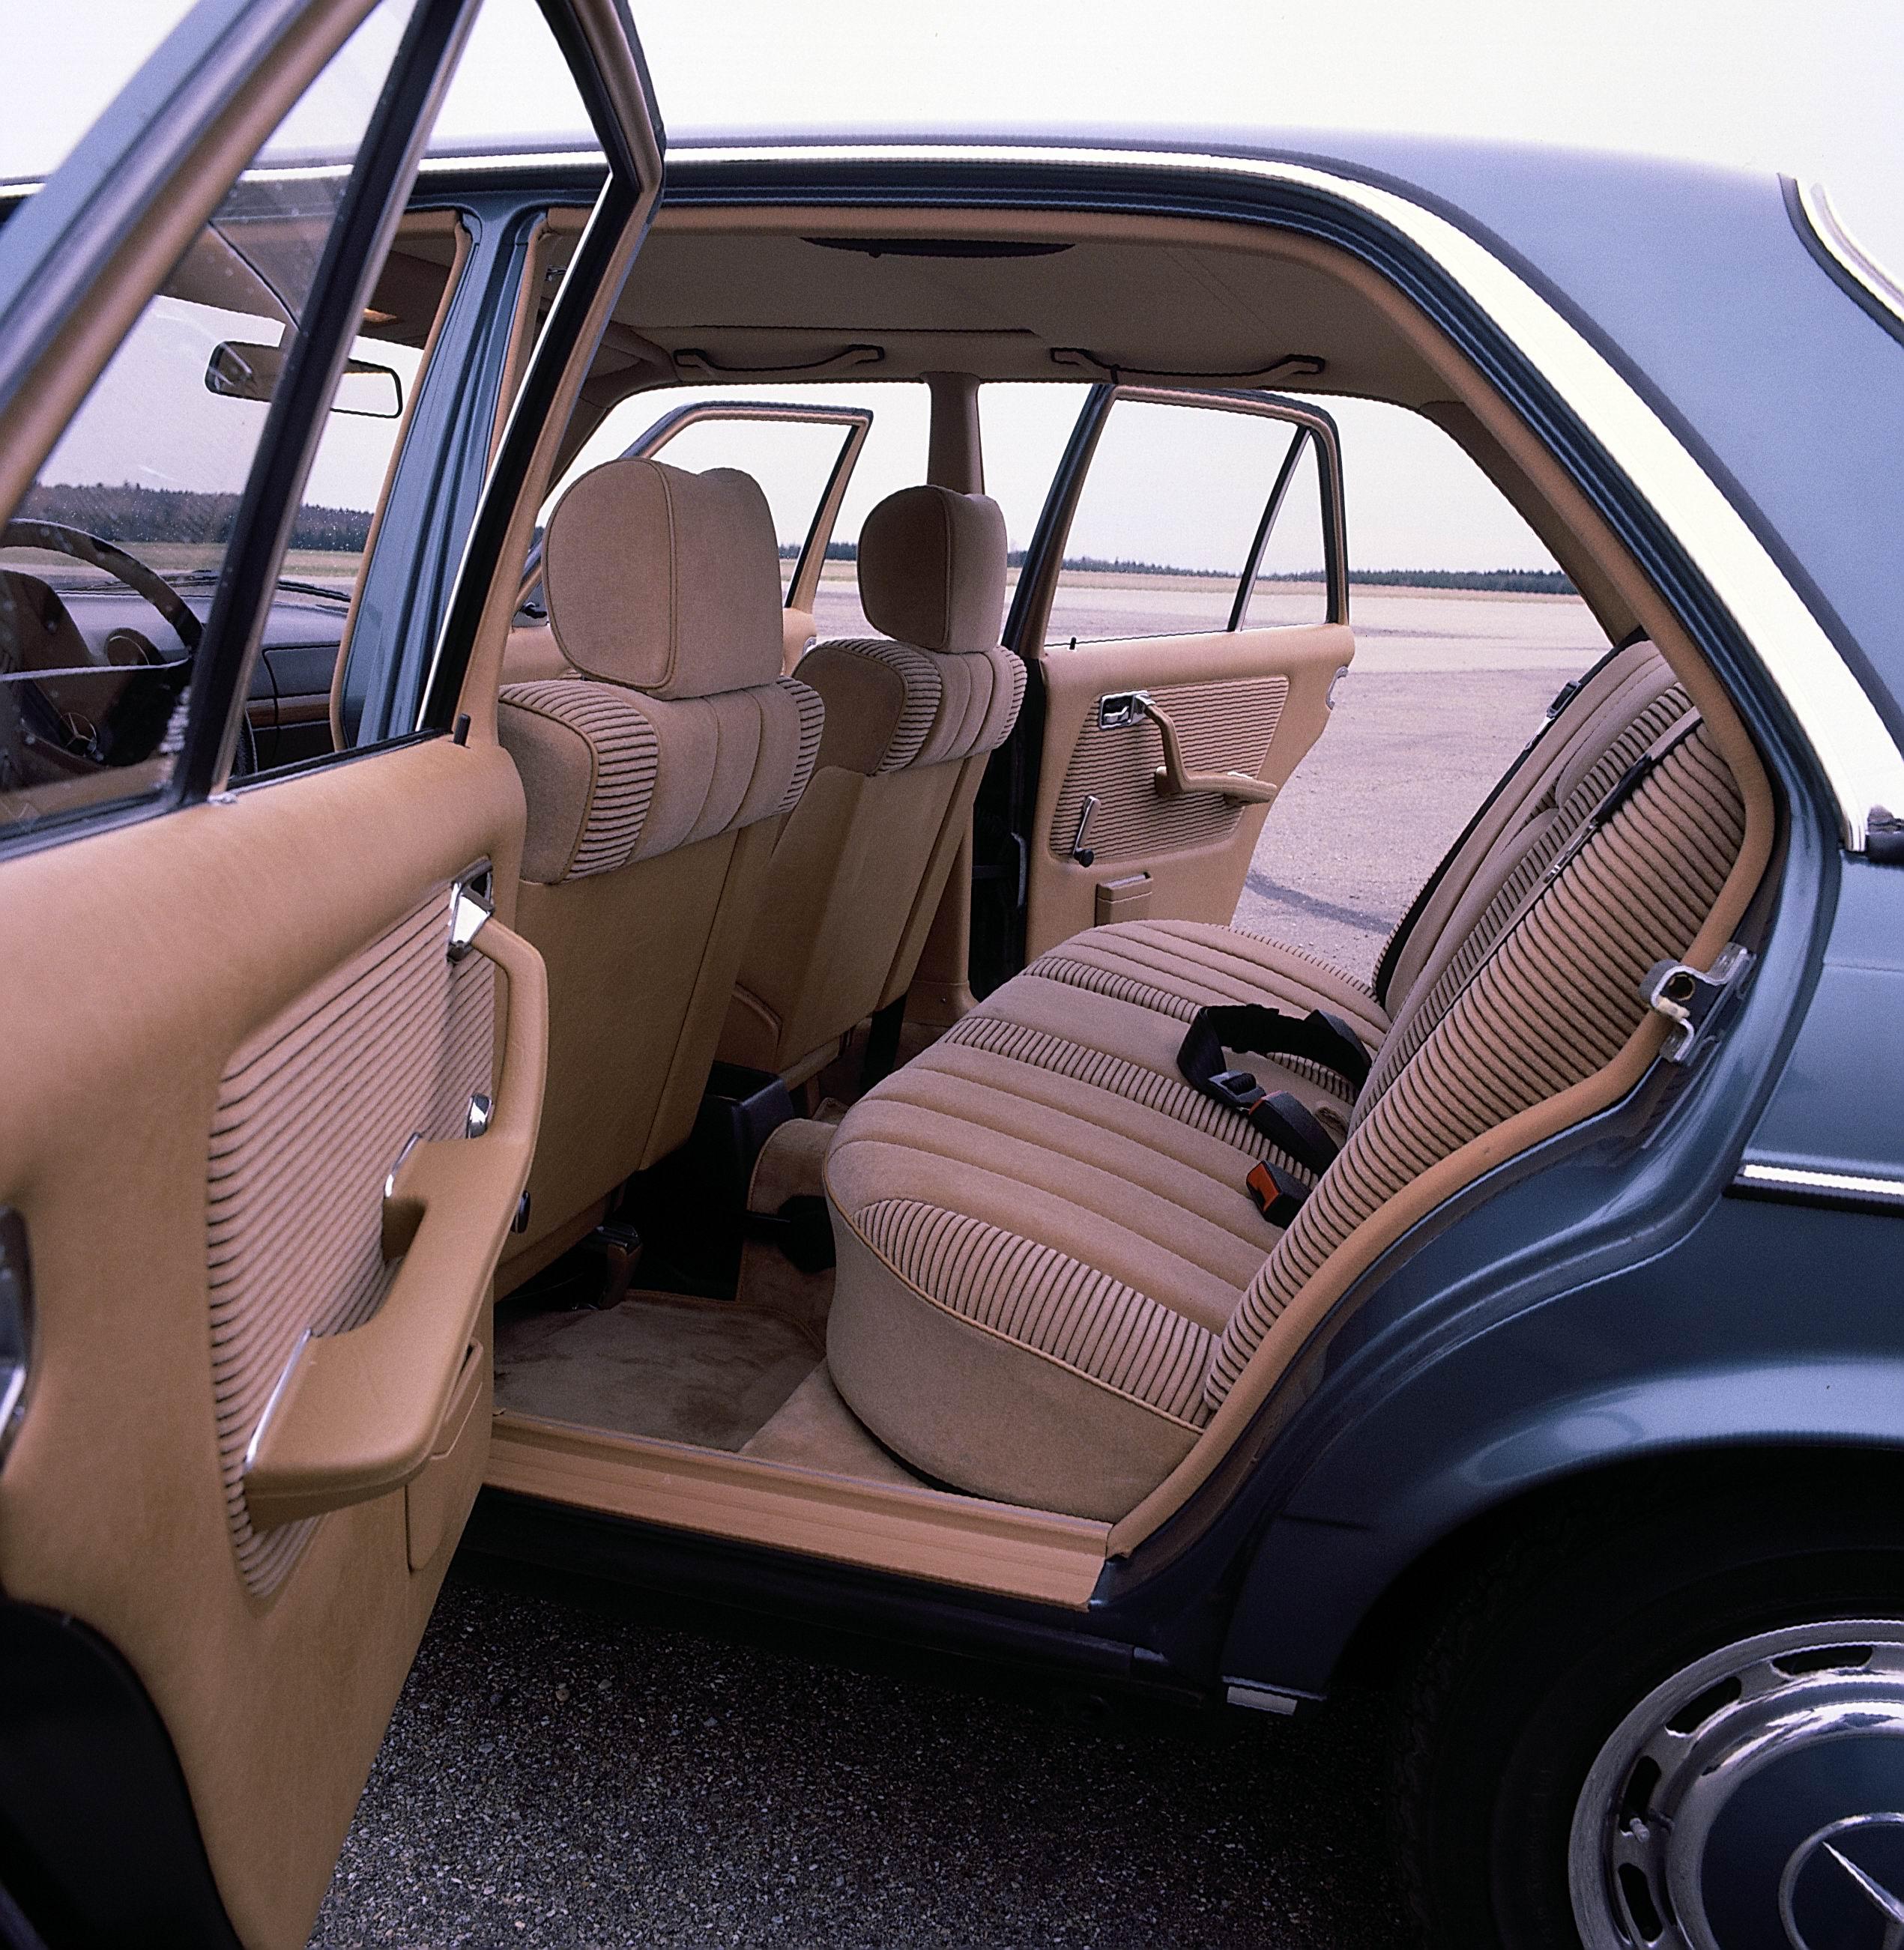 mercedes w123 benz 123 1975 class 1985 baureihe klasse series celebrates 40th anniversary 1976 legendary mustang 1983 1980 1978 jahre